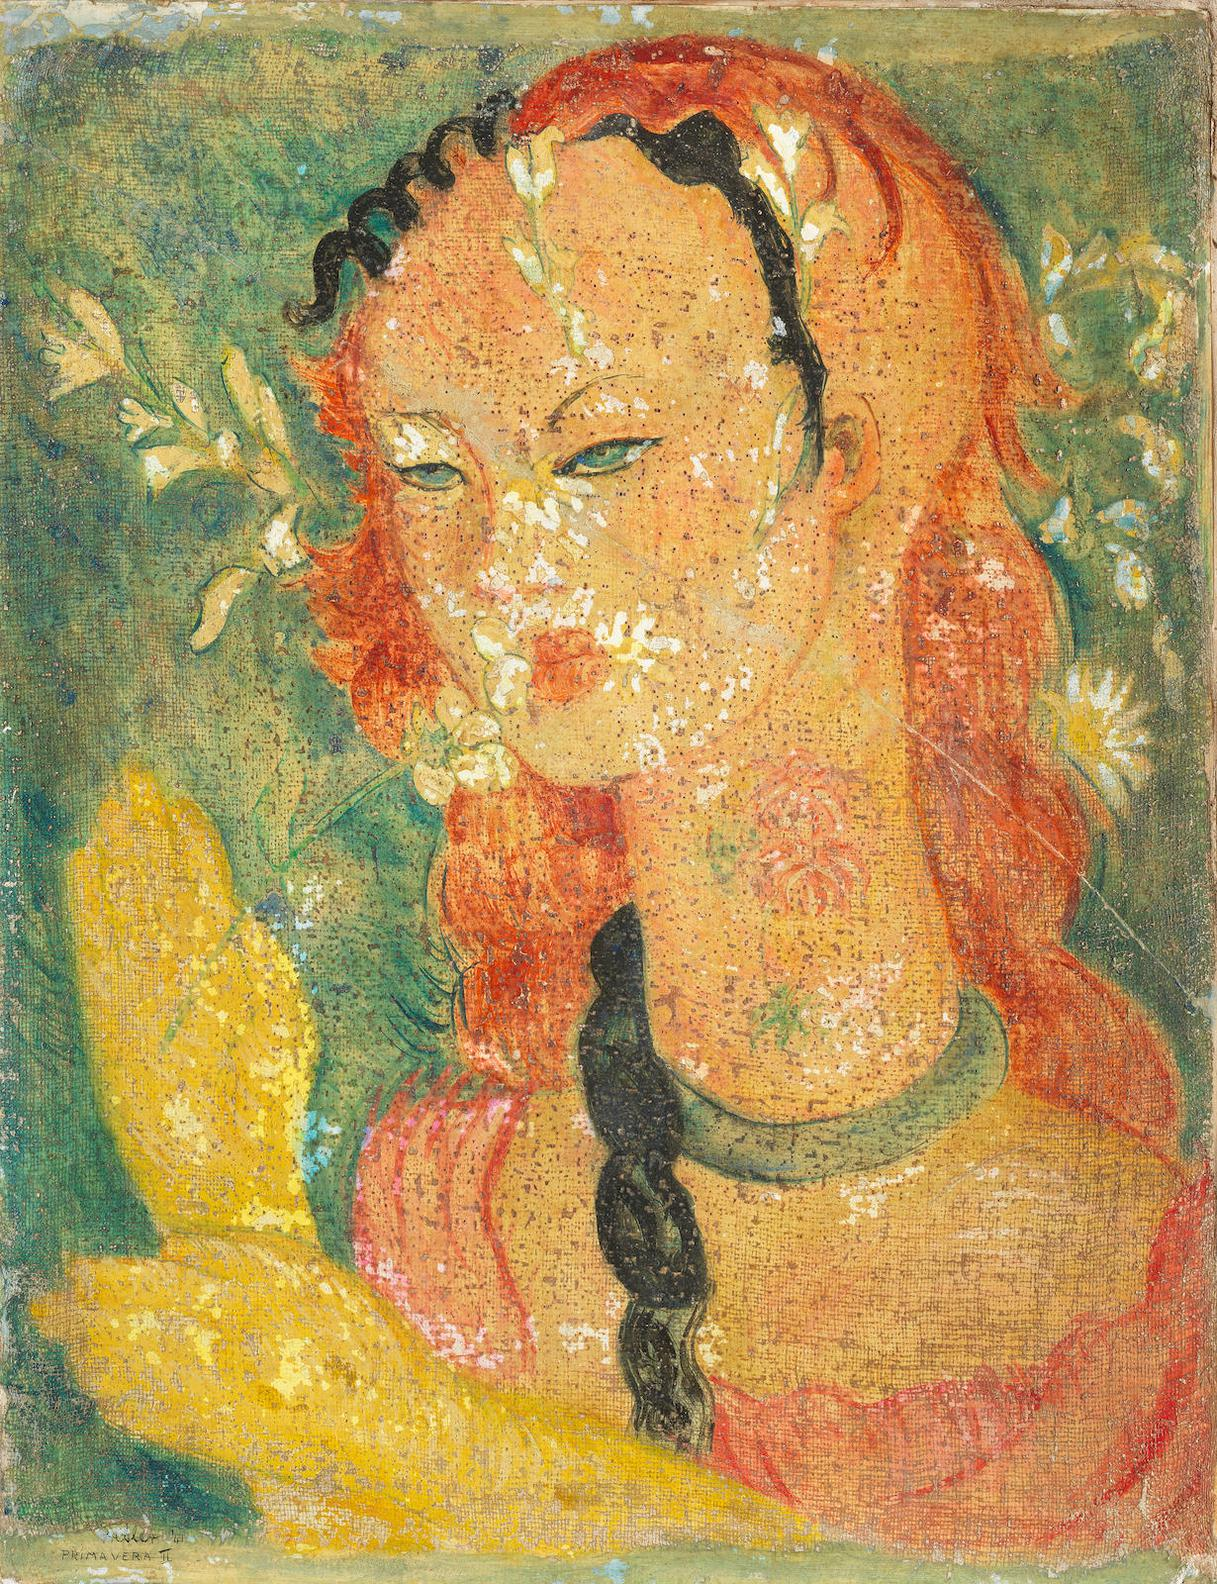 Alexis Preller - Primavera II-1941